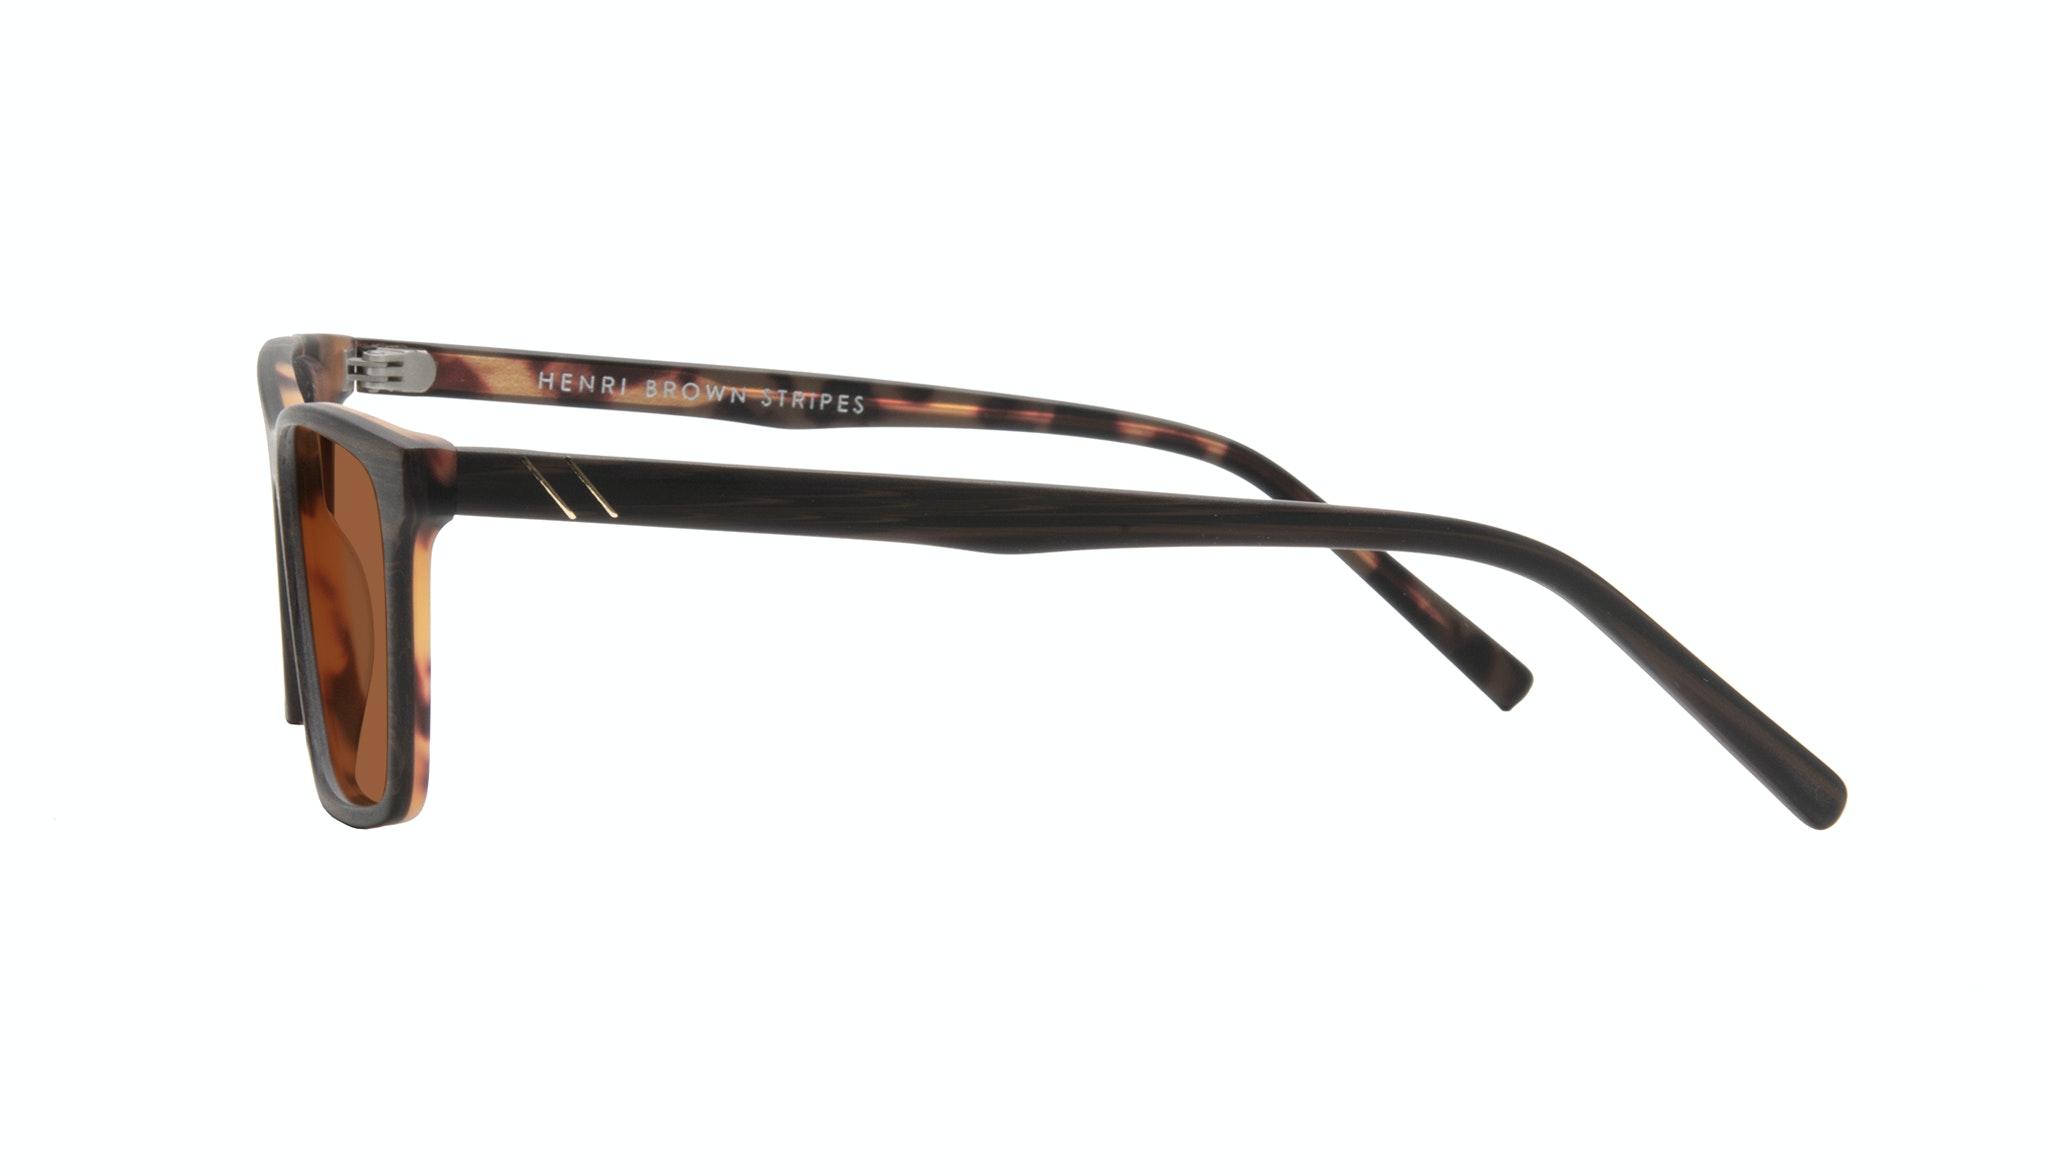 Affordable Fashion Glasses Rectangle Sunglasses Men Henri Brown Stripes Side